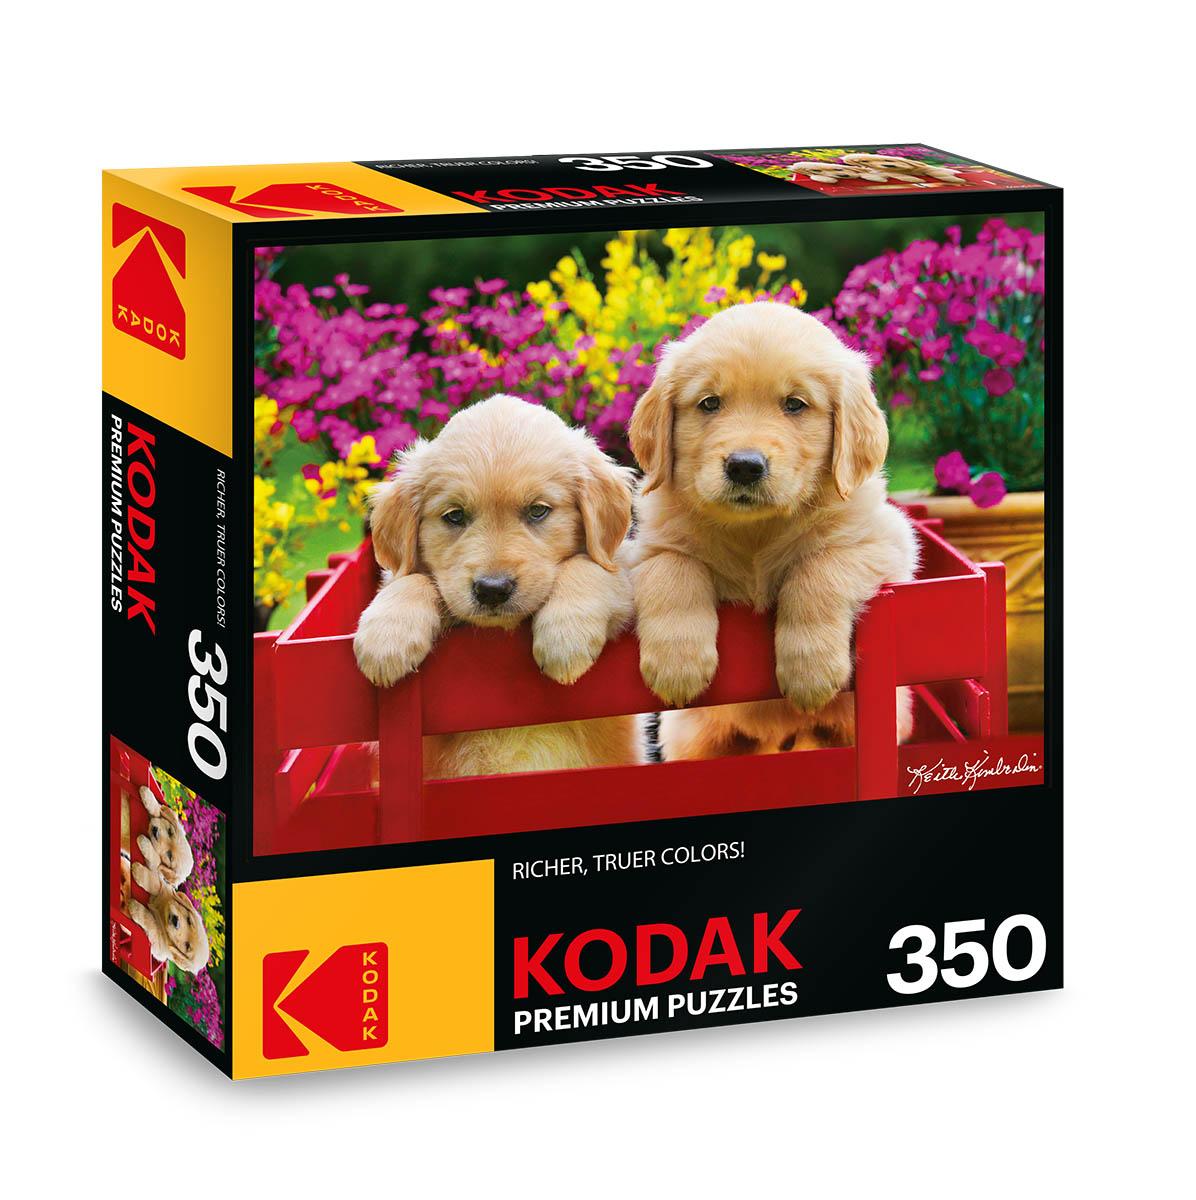 KODAK Premium Puzzles - Adorable Puppies Dogs Jigsaw Puzzle